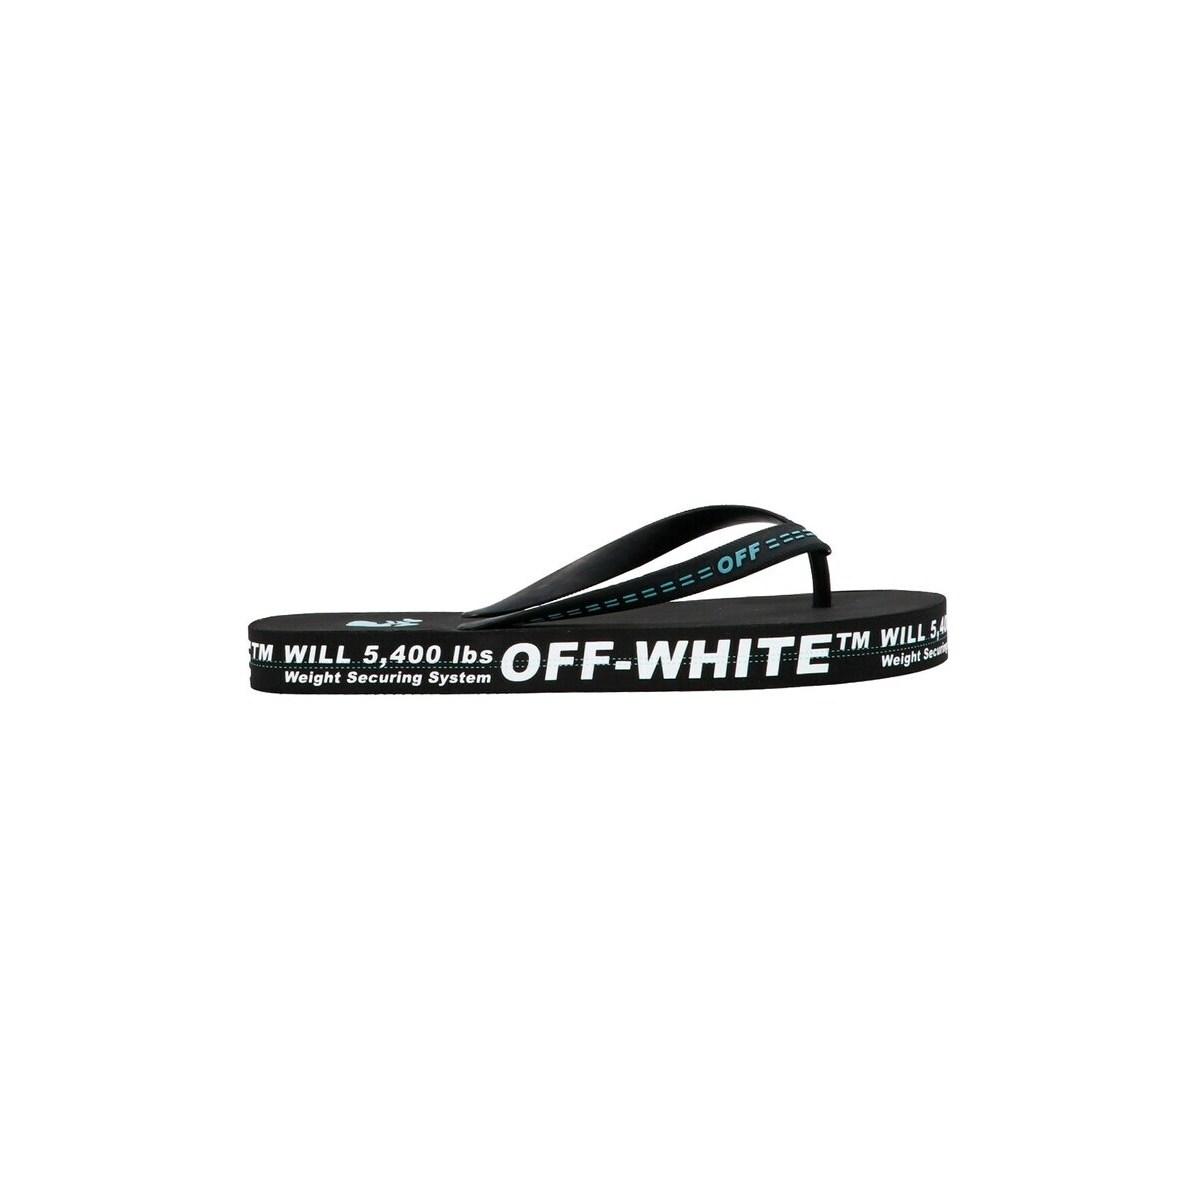 OFF WHITE オフホワイト ビーチサンダル o710at0z10z10zomic Nero メンズ 商品 税込3980円以上で送料無料 モデル着用 注目アイテム bianco ju OMIC002R21MAT00110011001 春夏2021